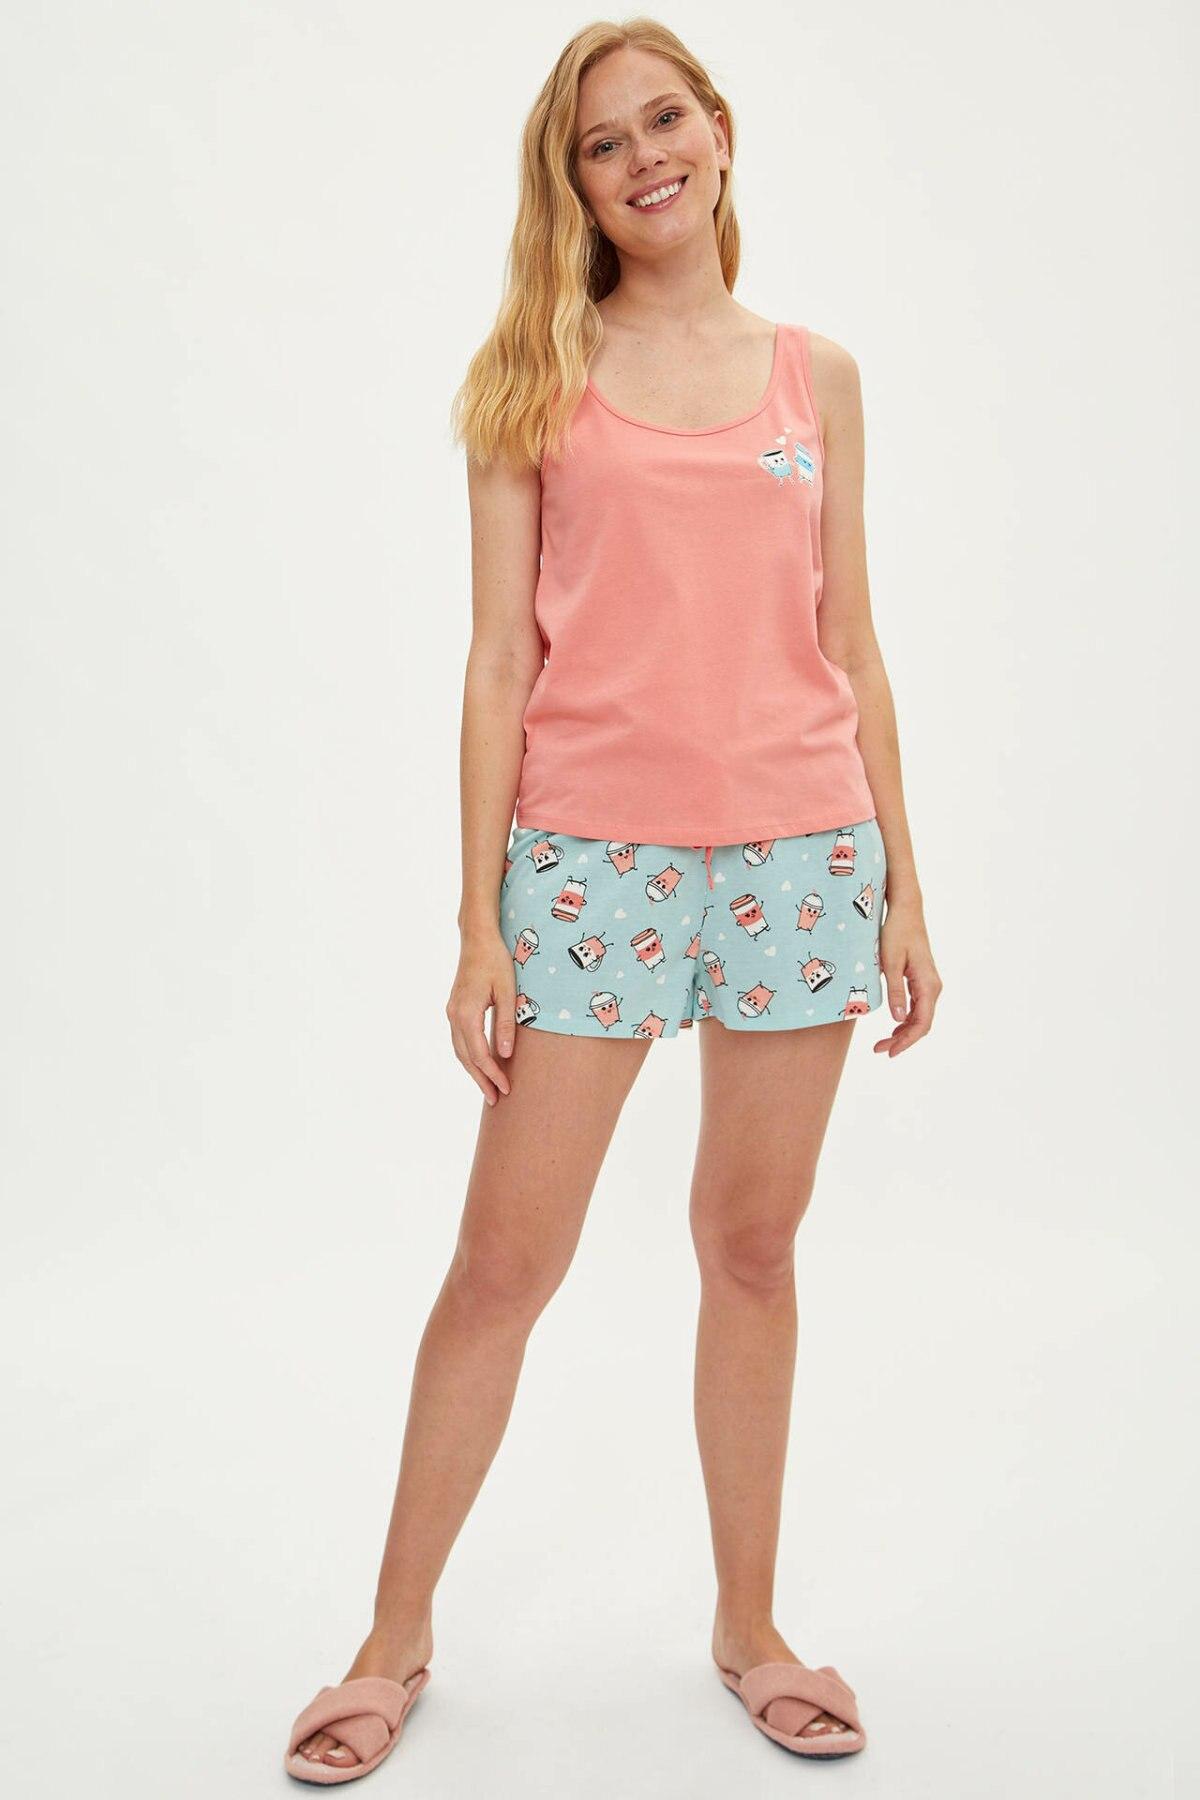 DeFacto Summer Woman Tank Shorts Knitted Sets Ladies Casual Sweet Cotton Vest Short Pants Female Comfort New - K9572AZ19HS